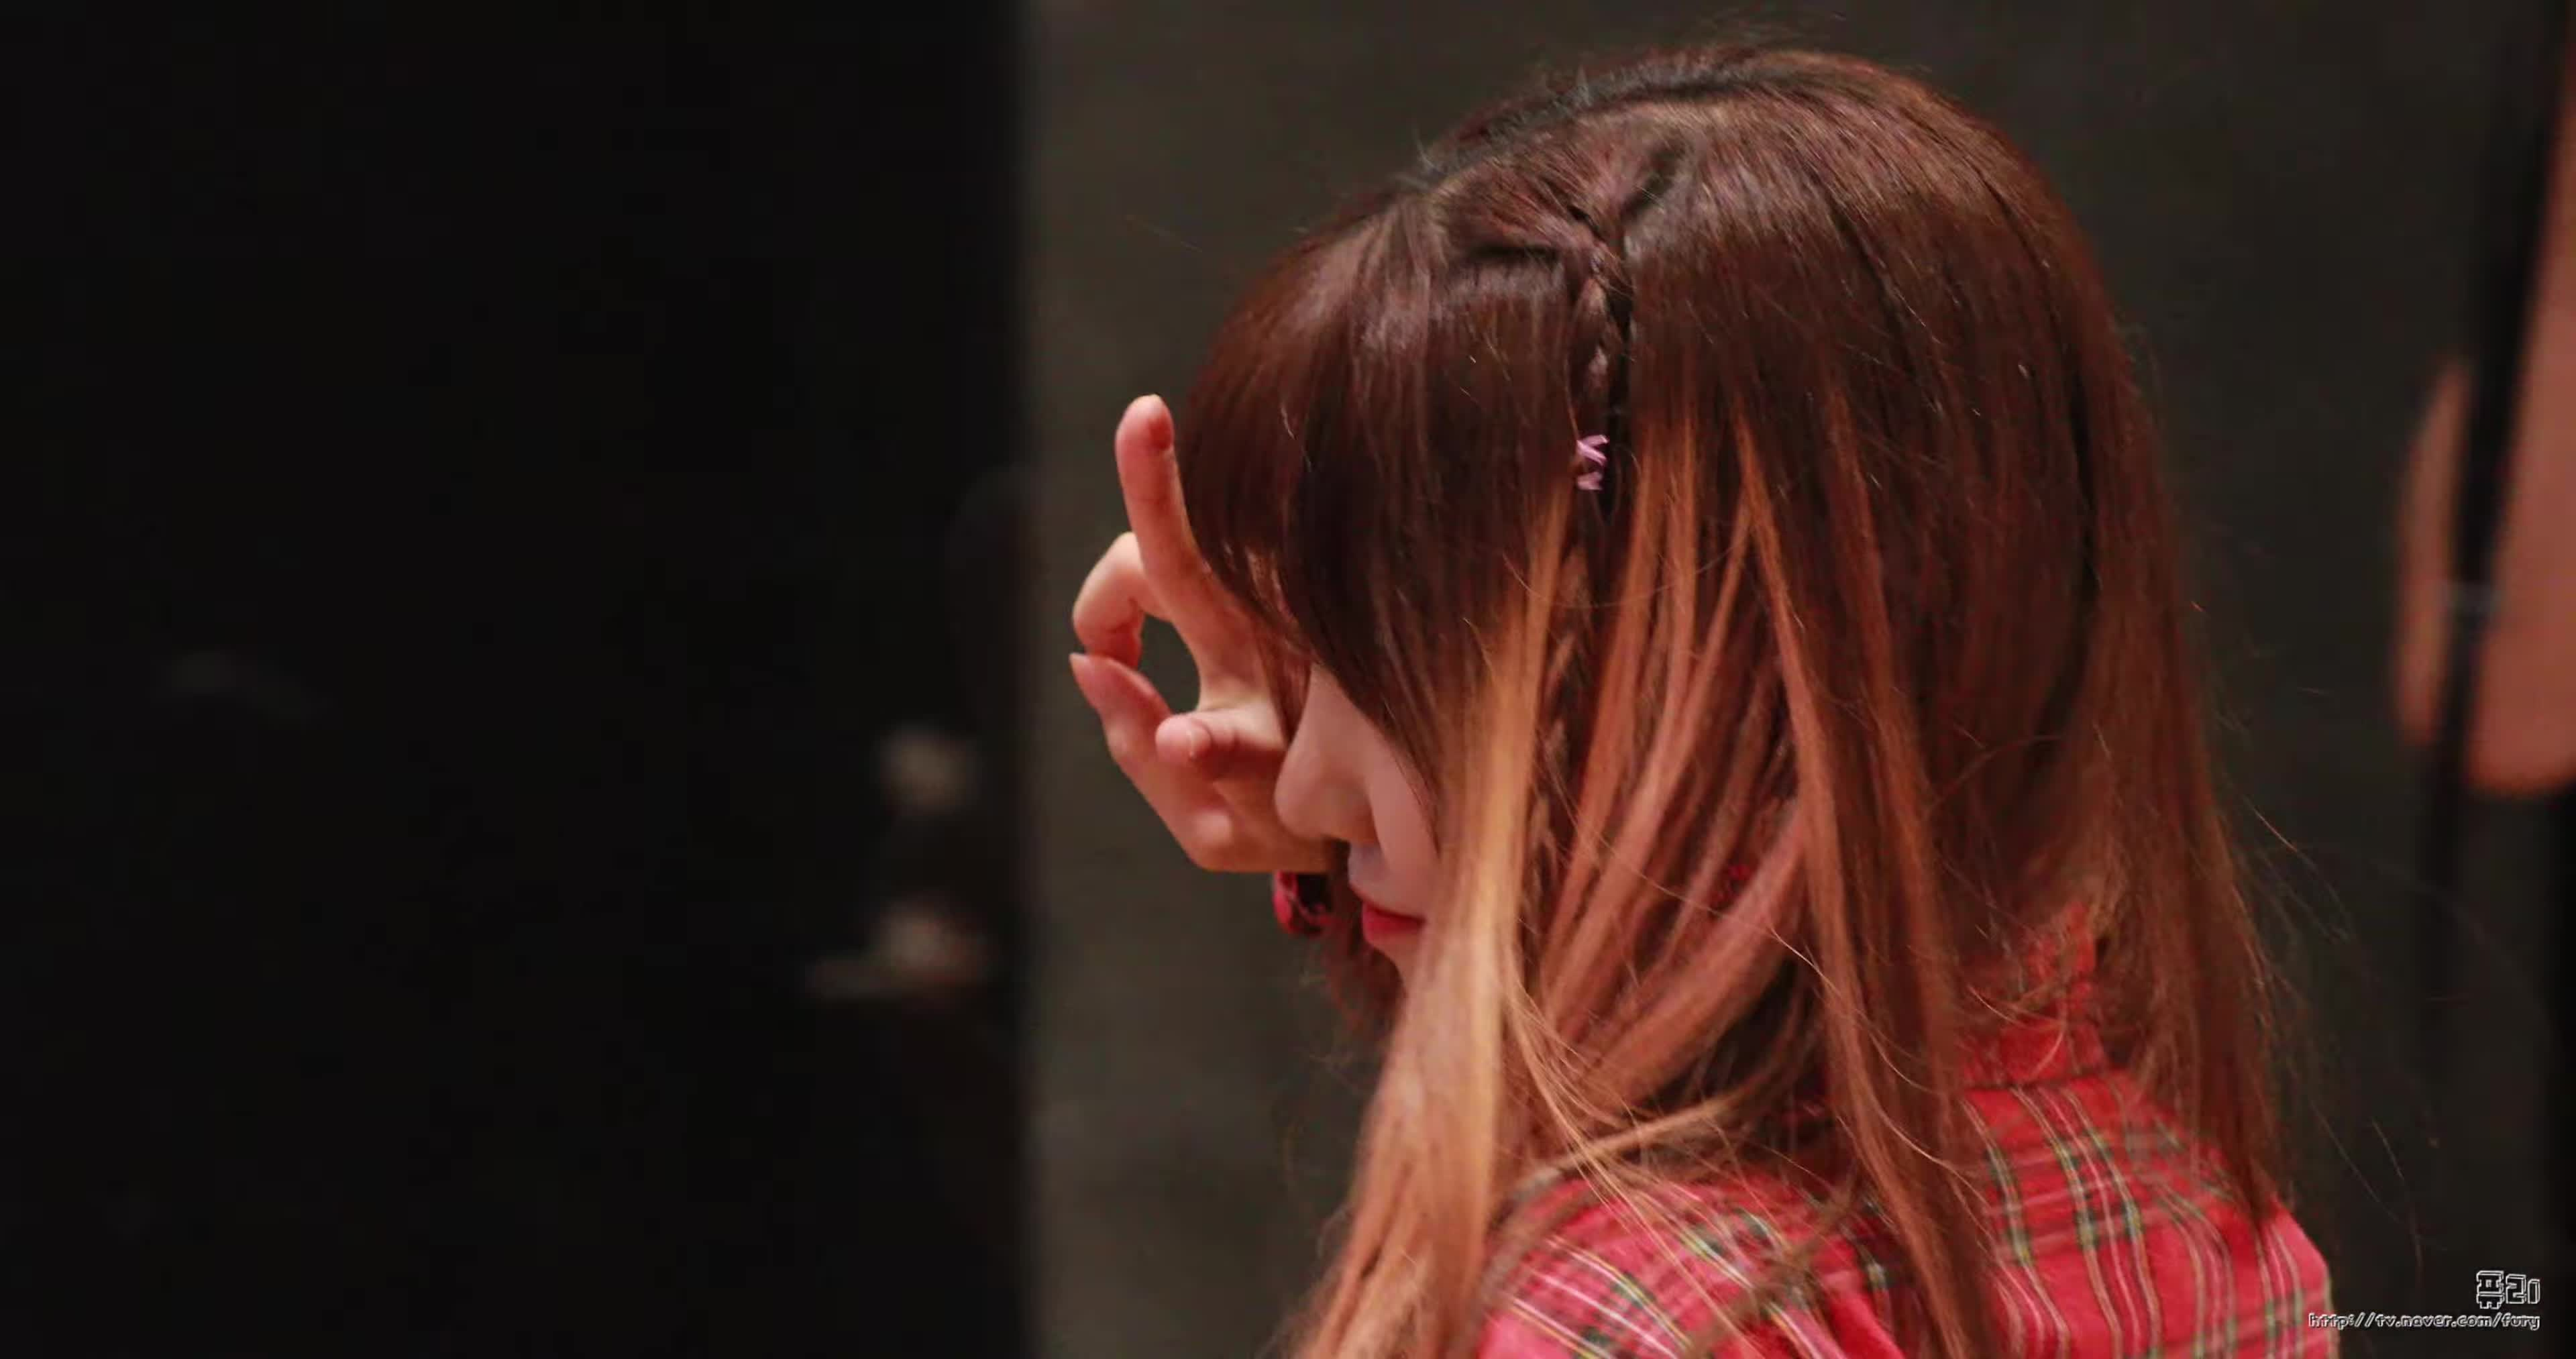 Mnet, RohJisun, blep, fromis, fromis_9, jisun, 盧知宣, 노지선, 아이돌학교, 엠카운트다운, 직캠, 프로미스나인, jisun blep GIFs